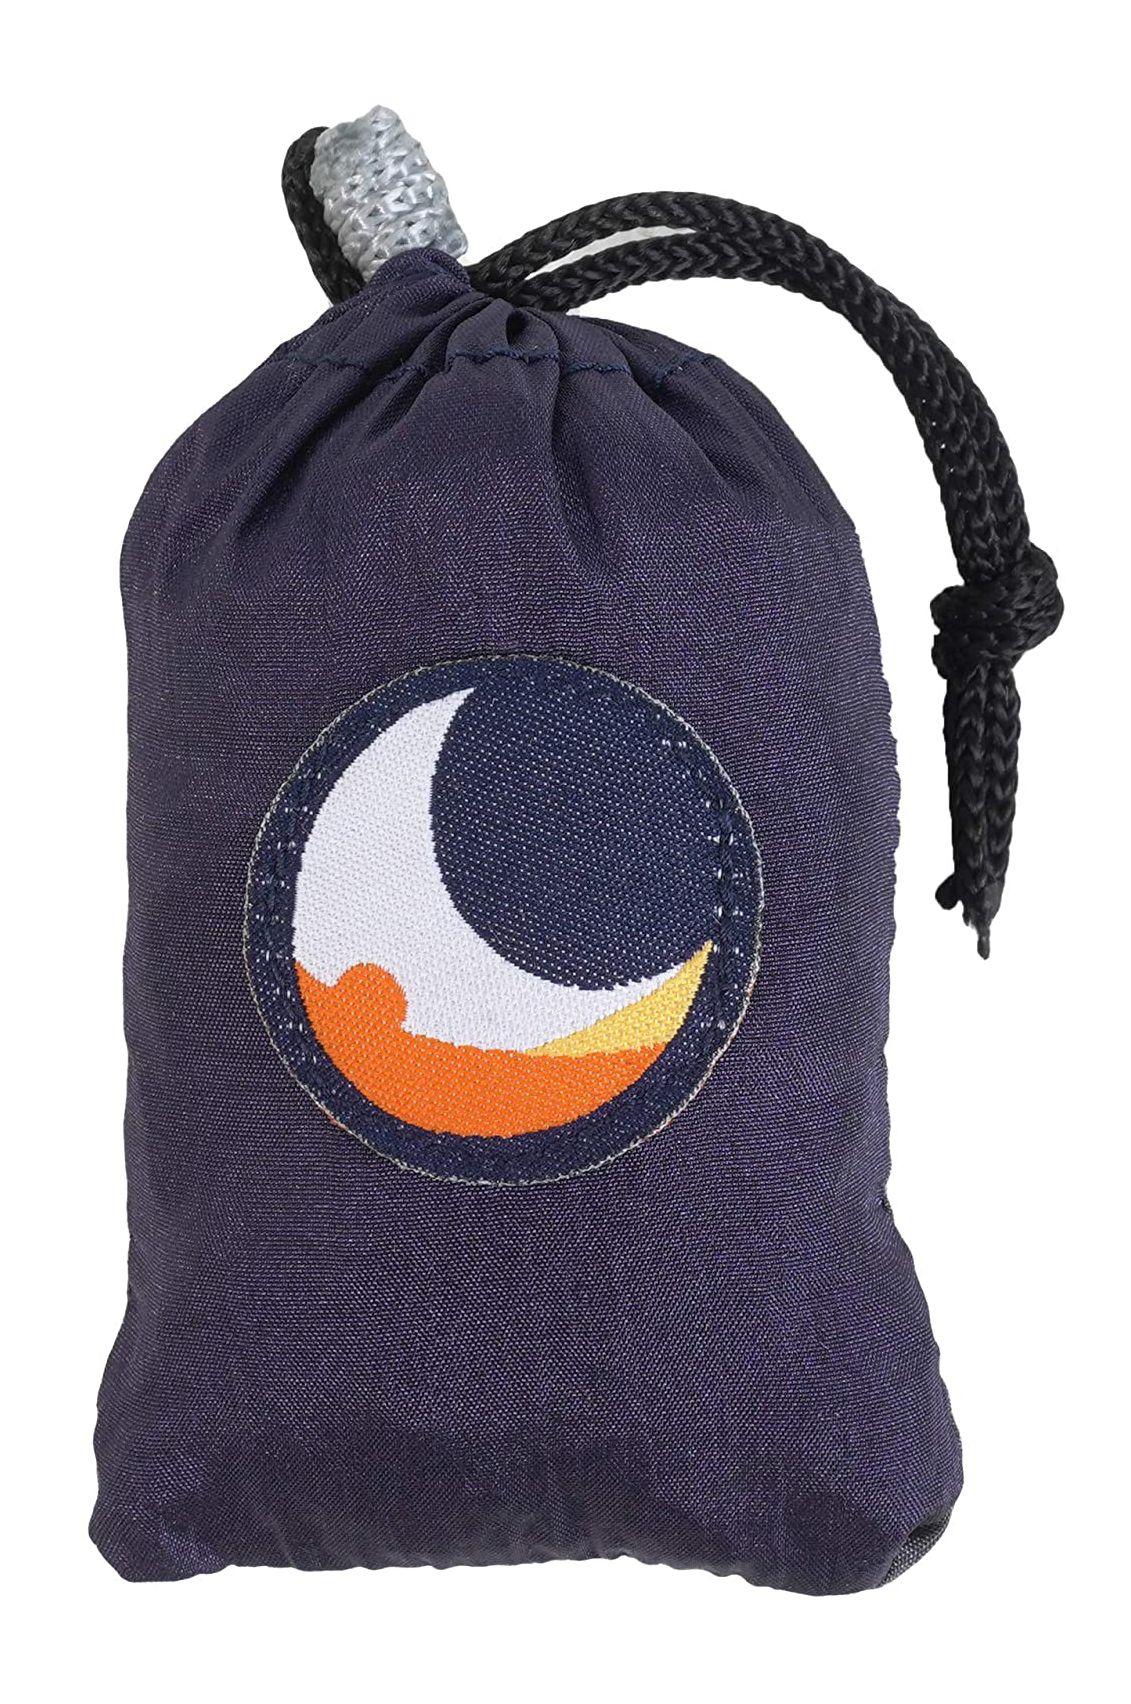 Saco Ticket To The Moon ECO BAG SMALL Navy Blue/Dark Grey